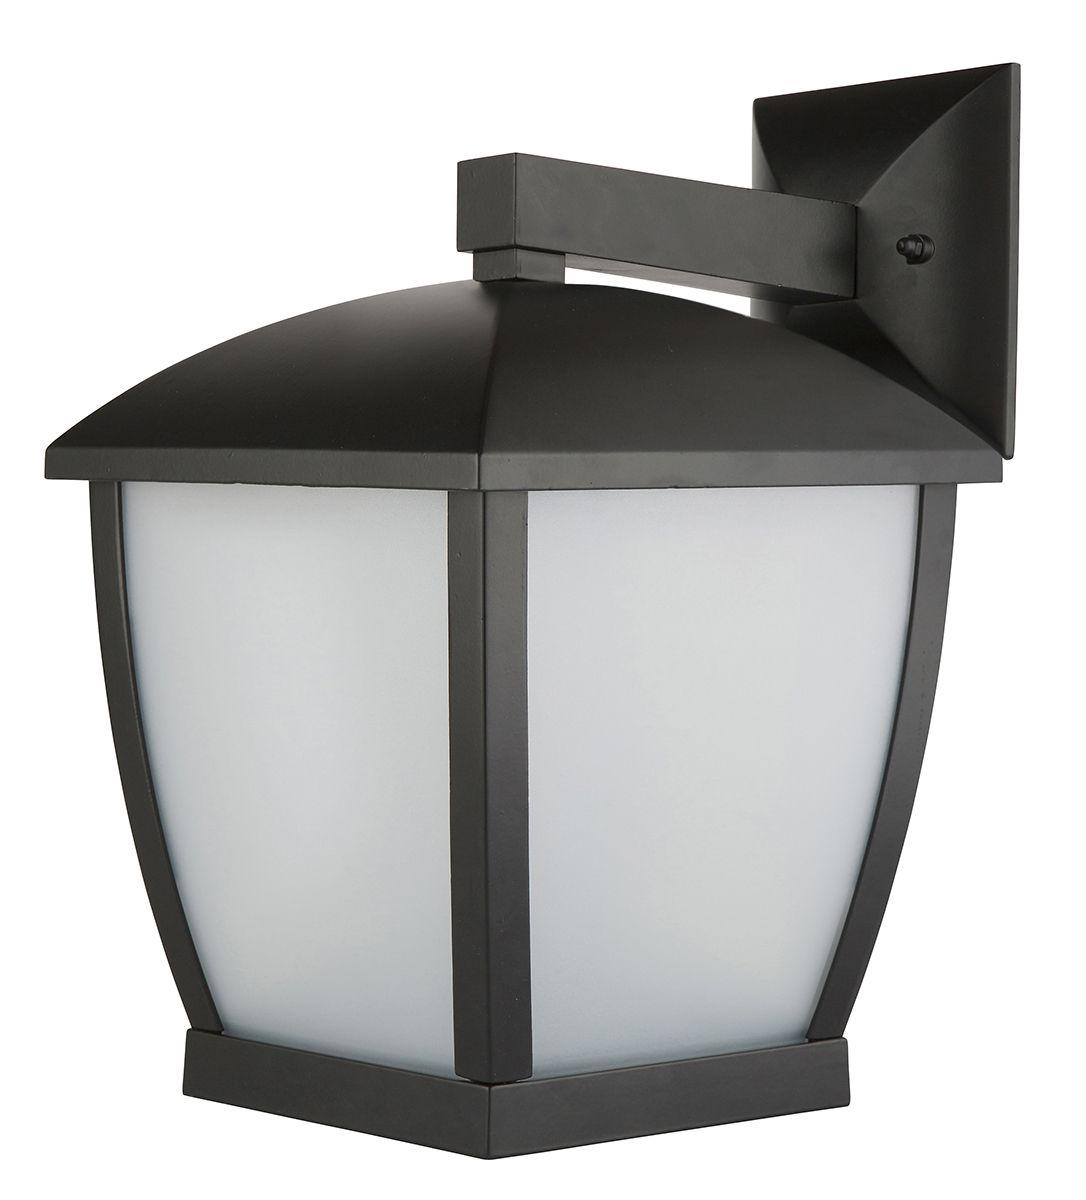 Outdoor Wall Light Accessories: Ashby Modern Coach Wall Light In Black